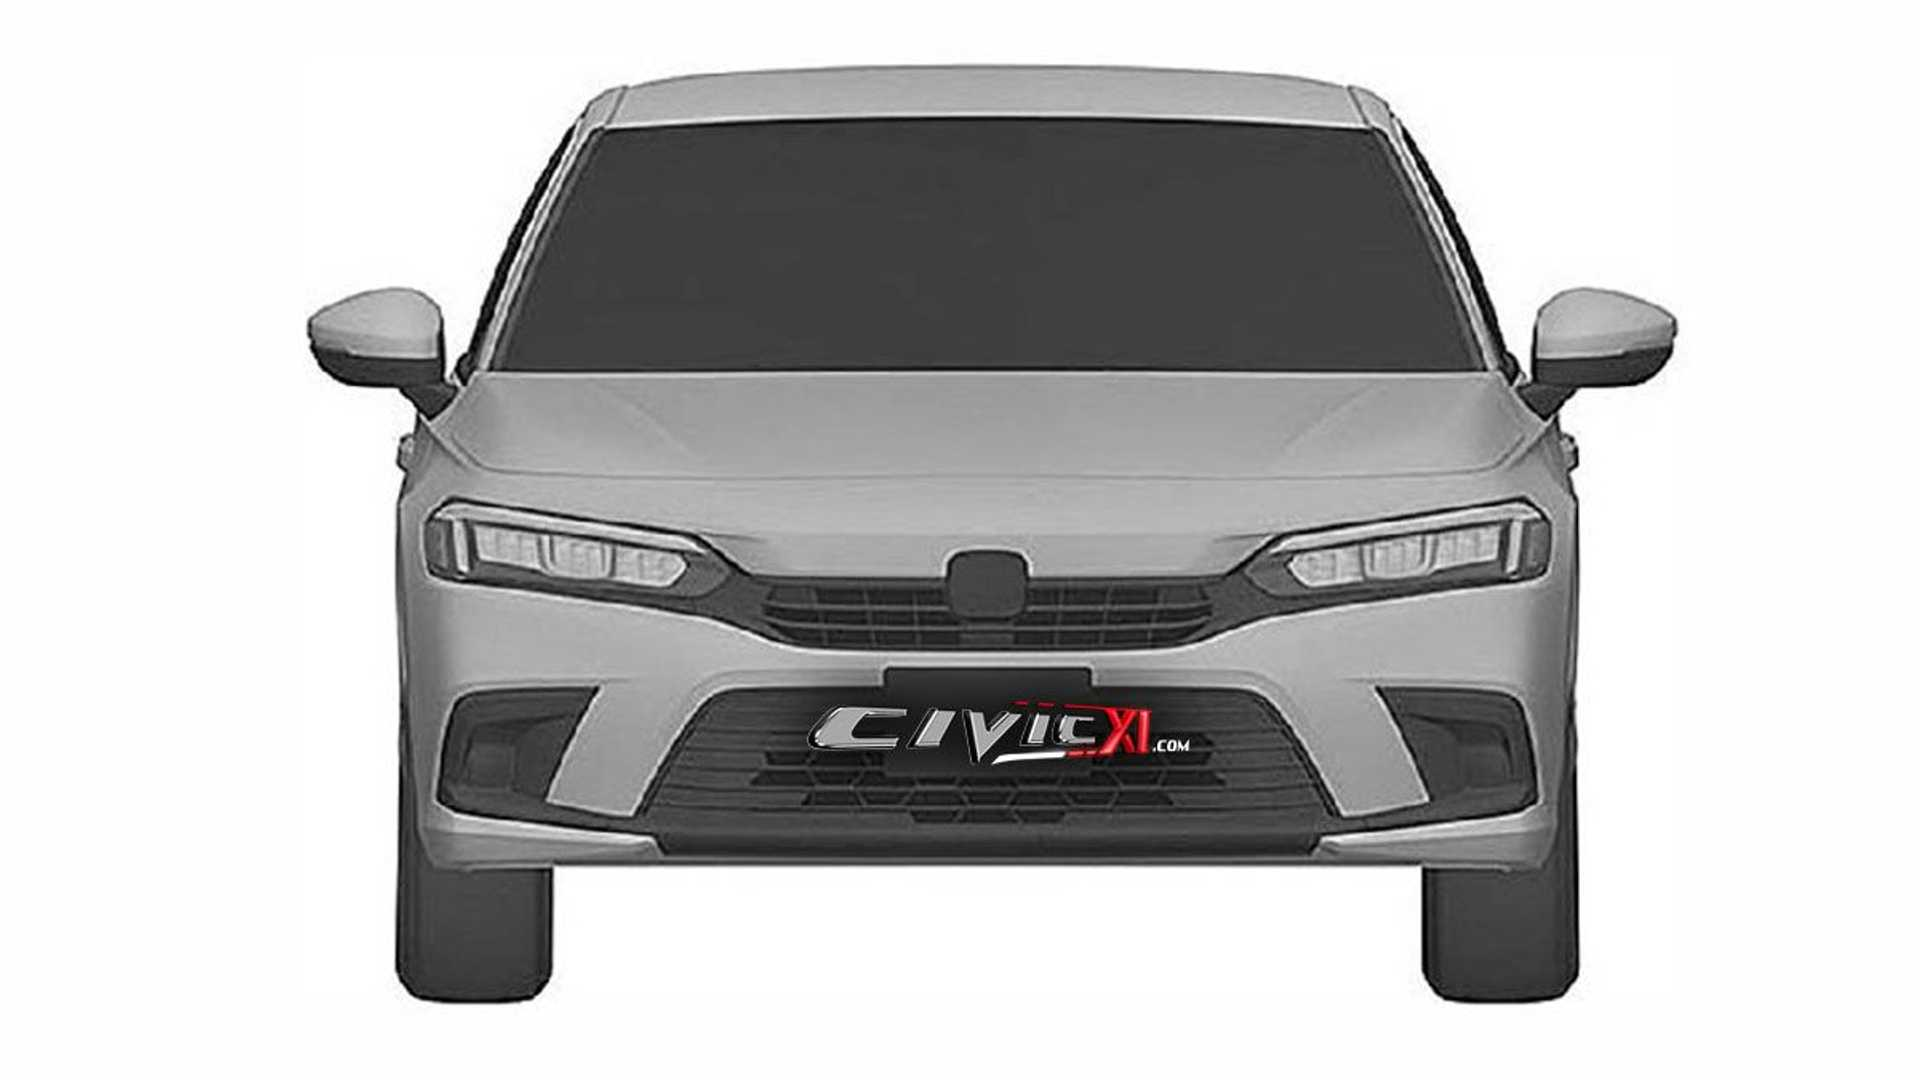 2022-honda-civic-sedan-front-fascia-at-patent-office